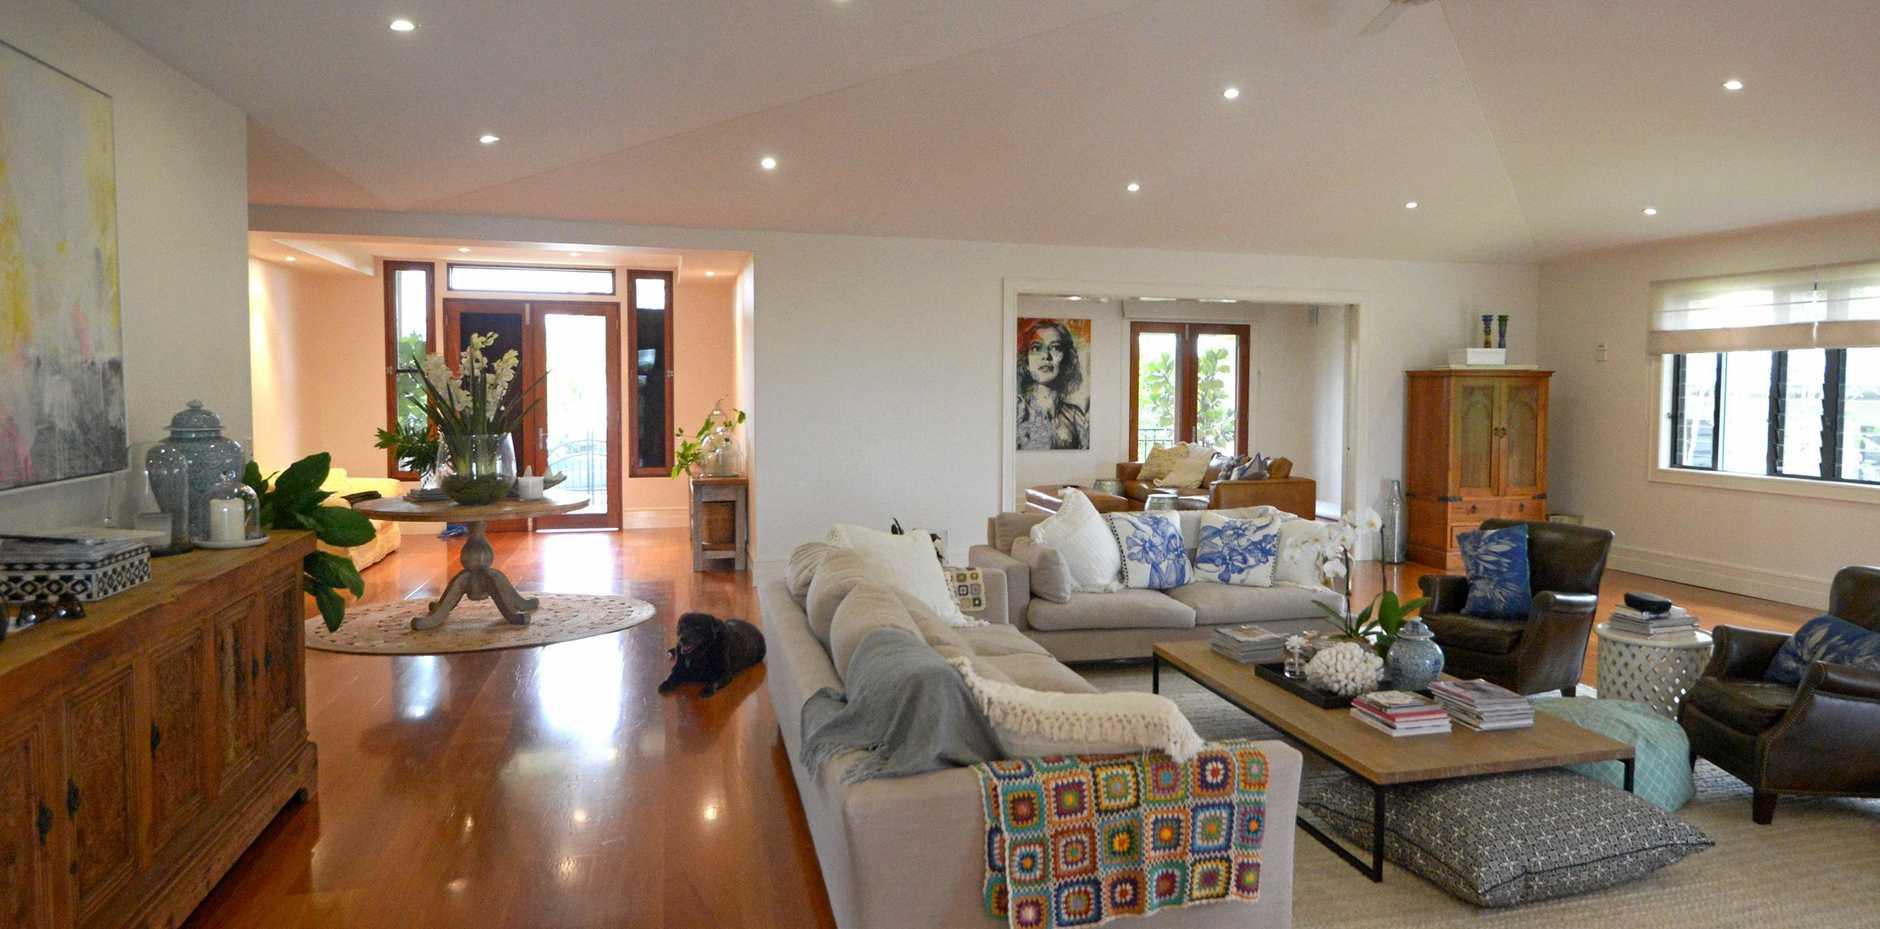 Open plan living at 50 Agnes St, The Range, Rockhampton